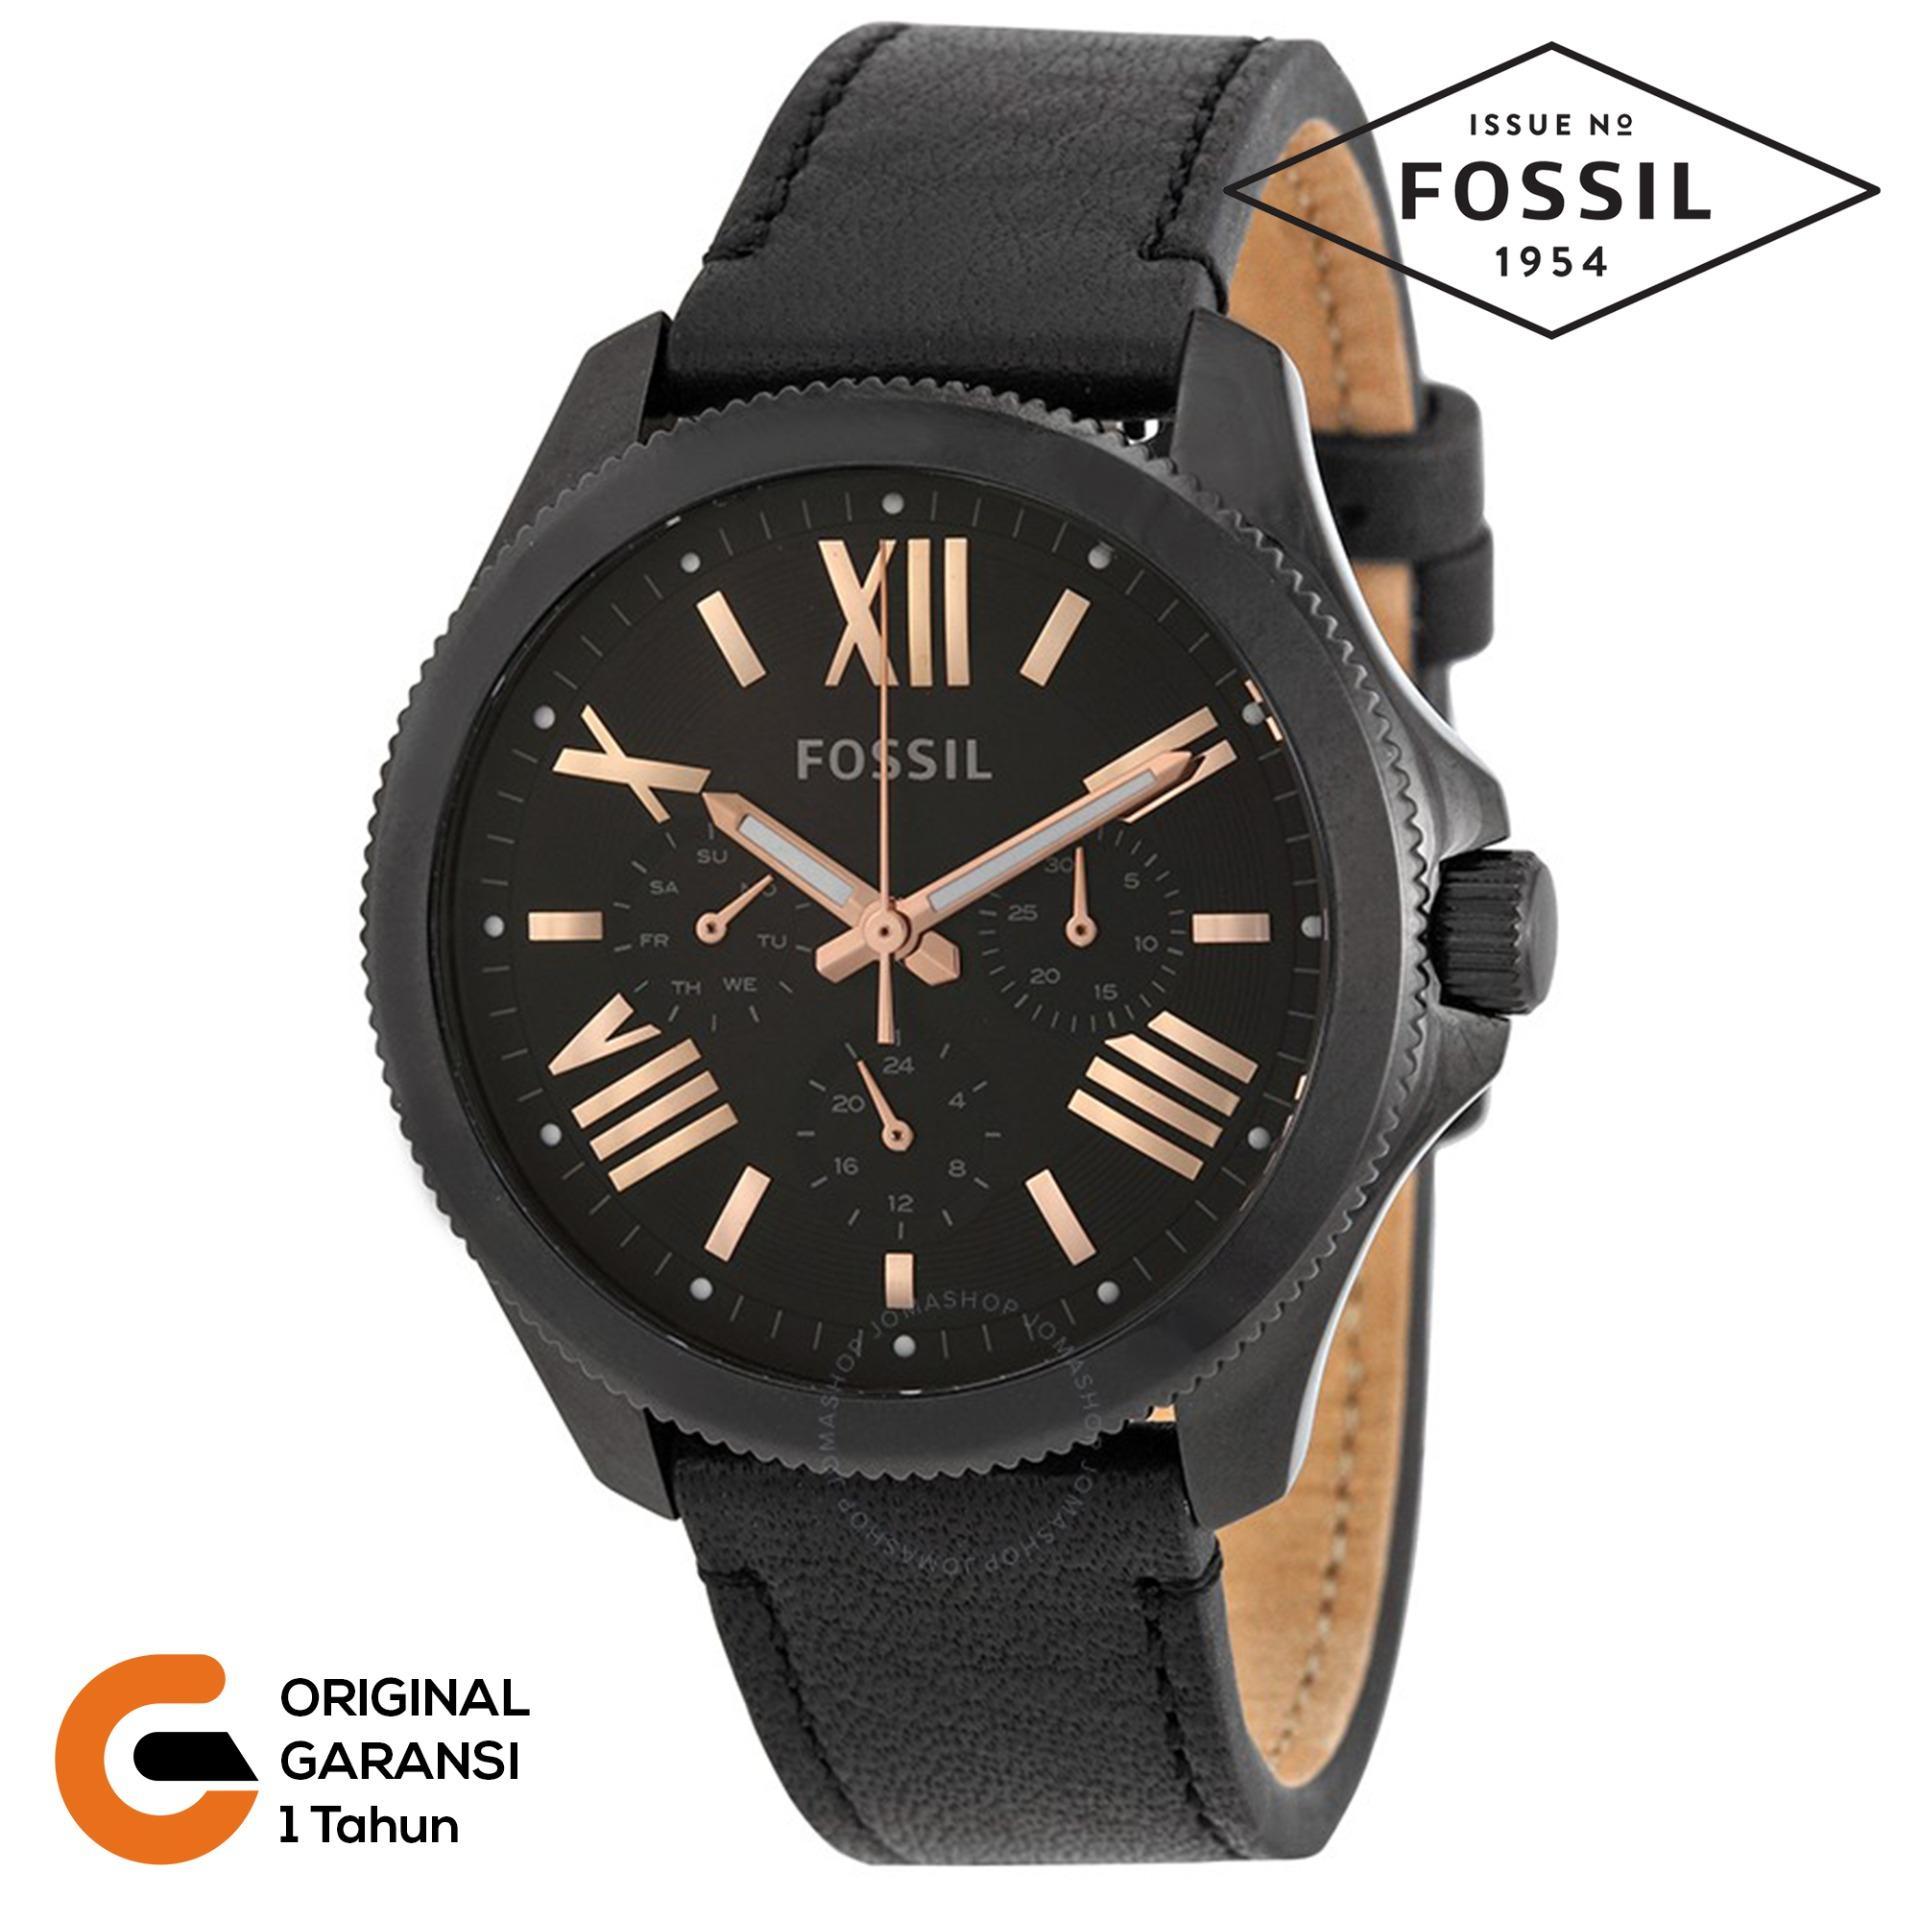 Jual Jam Tangan Fossil Terbaru Es3954 Tailor Multifunction Light Brown Leather Watch Wanita Am4532 Am4523 Tali Kulit Strap Coklat